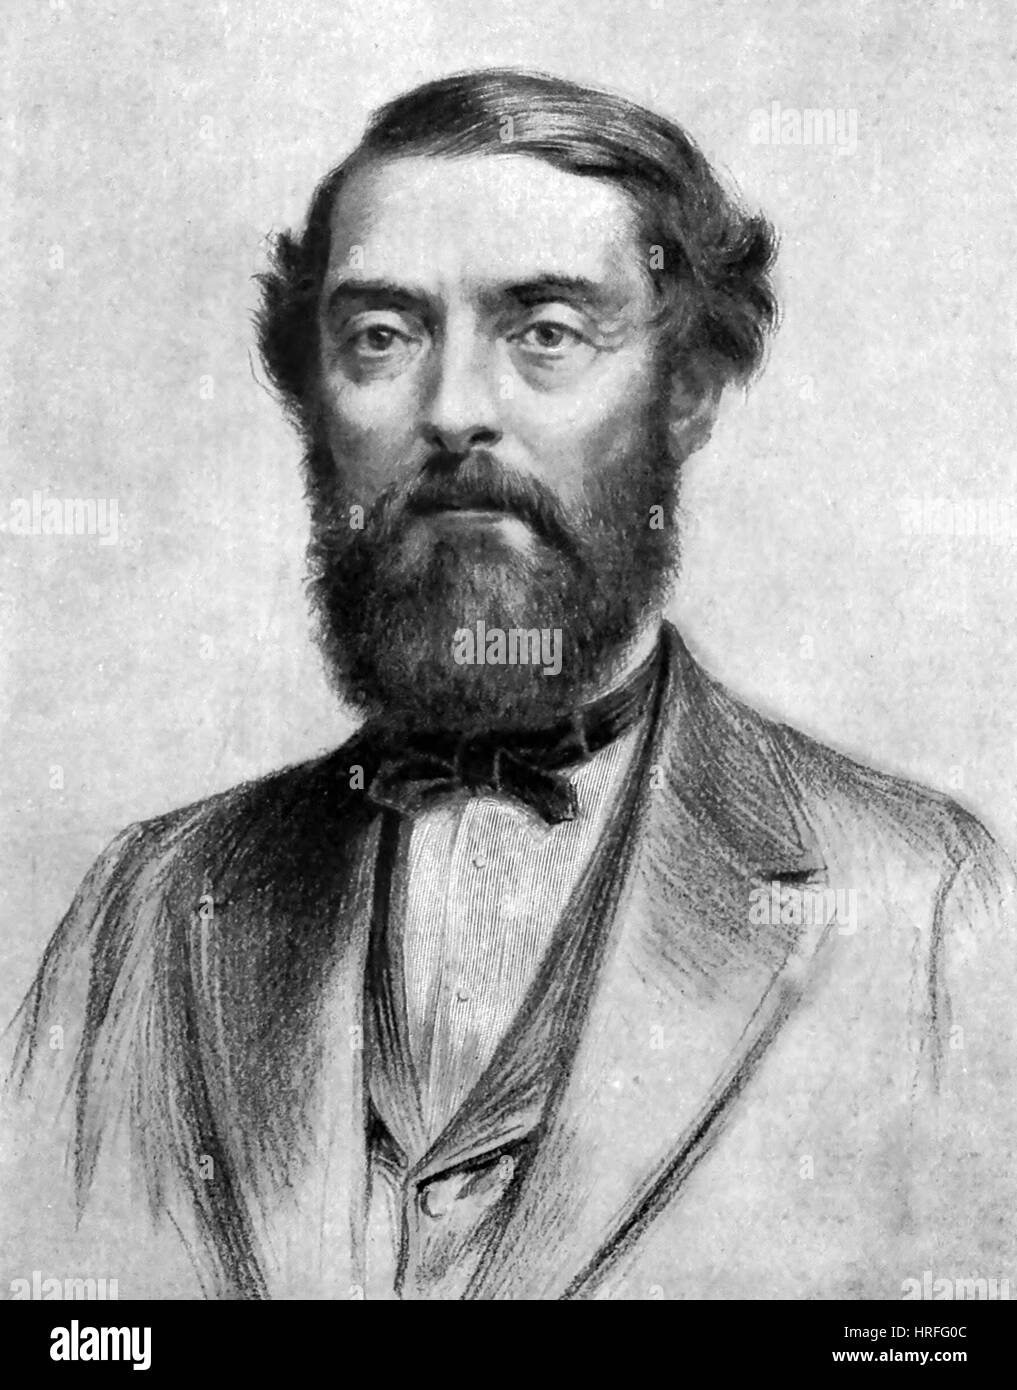 EDWIN DRAKE (1819-1880) American oil prospector - Stock Image